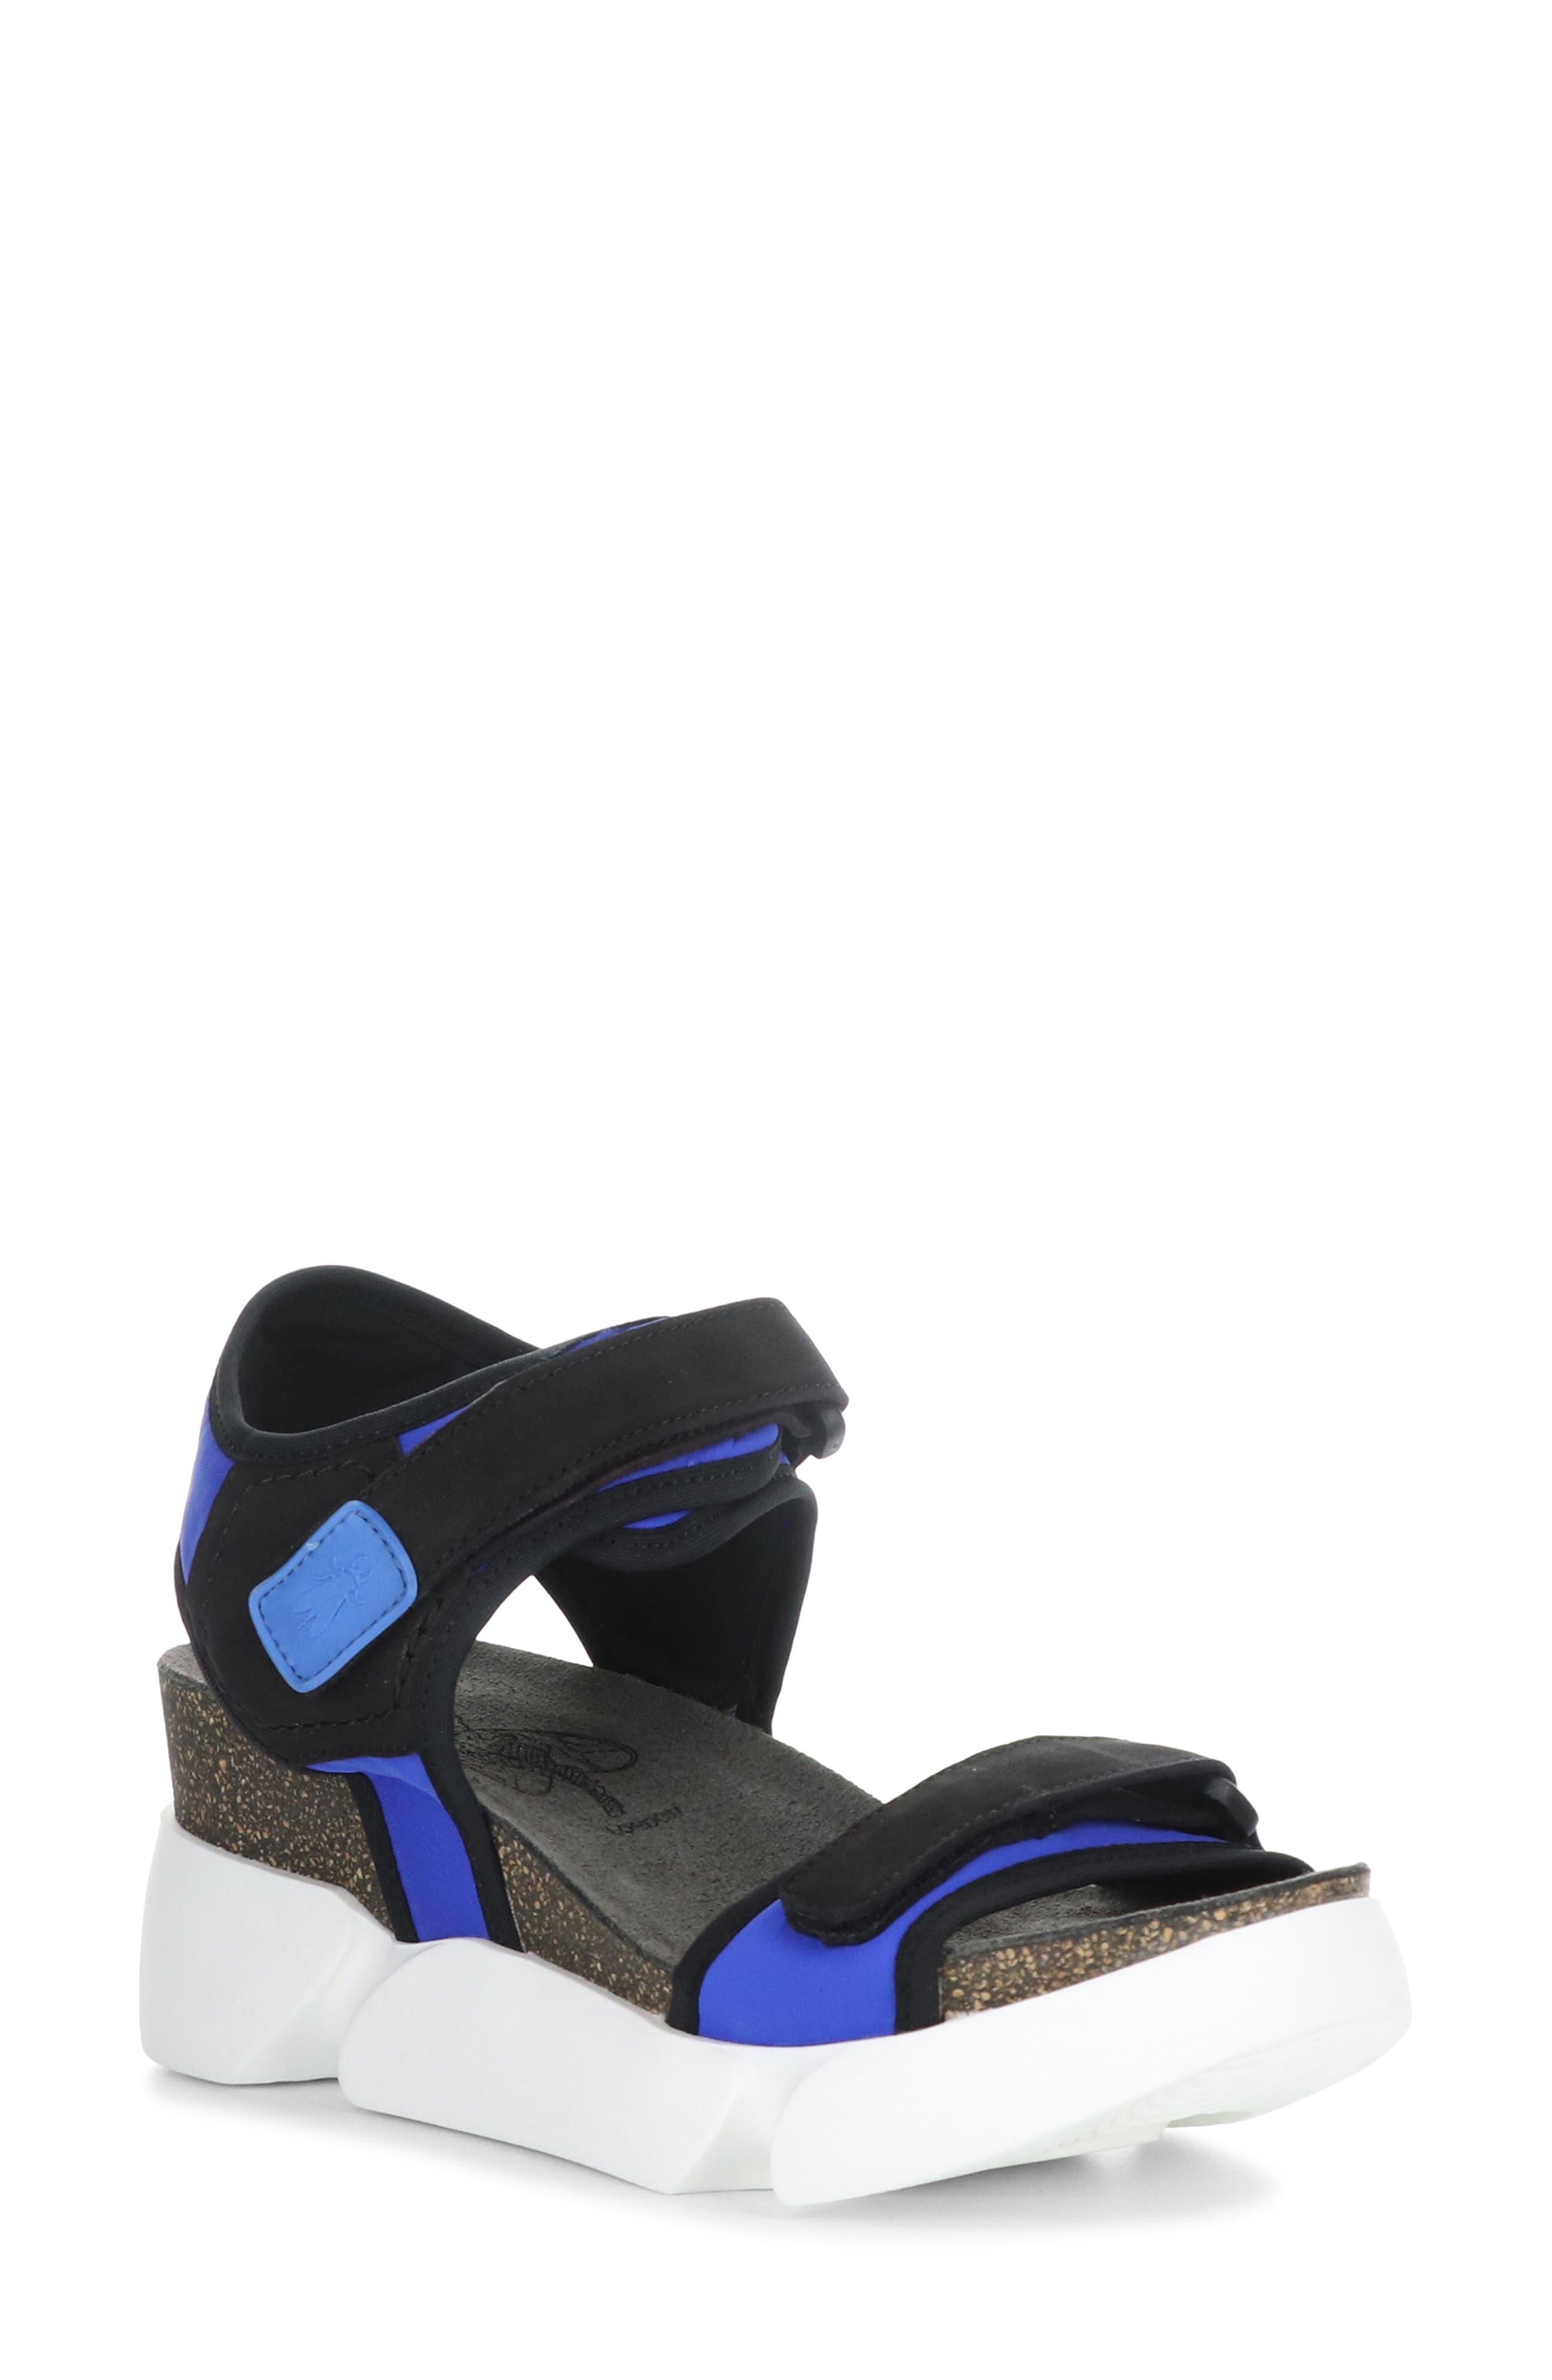 Sigo Wedge Sandal